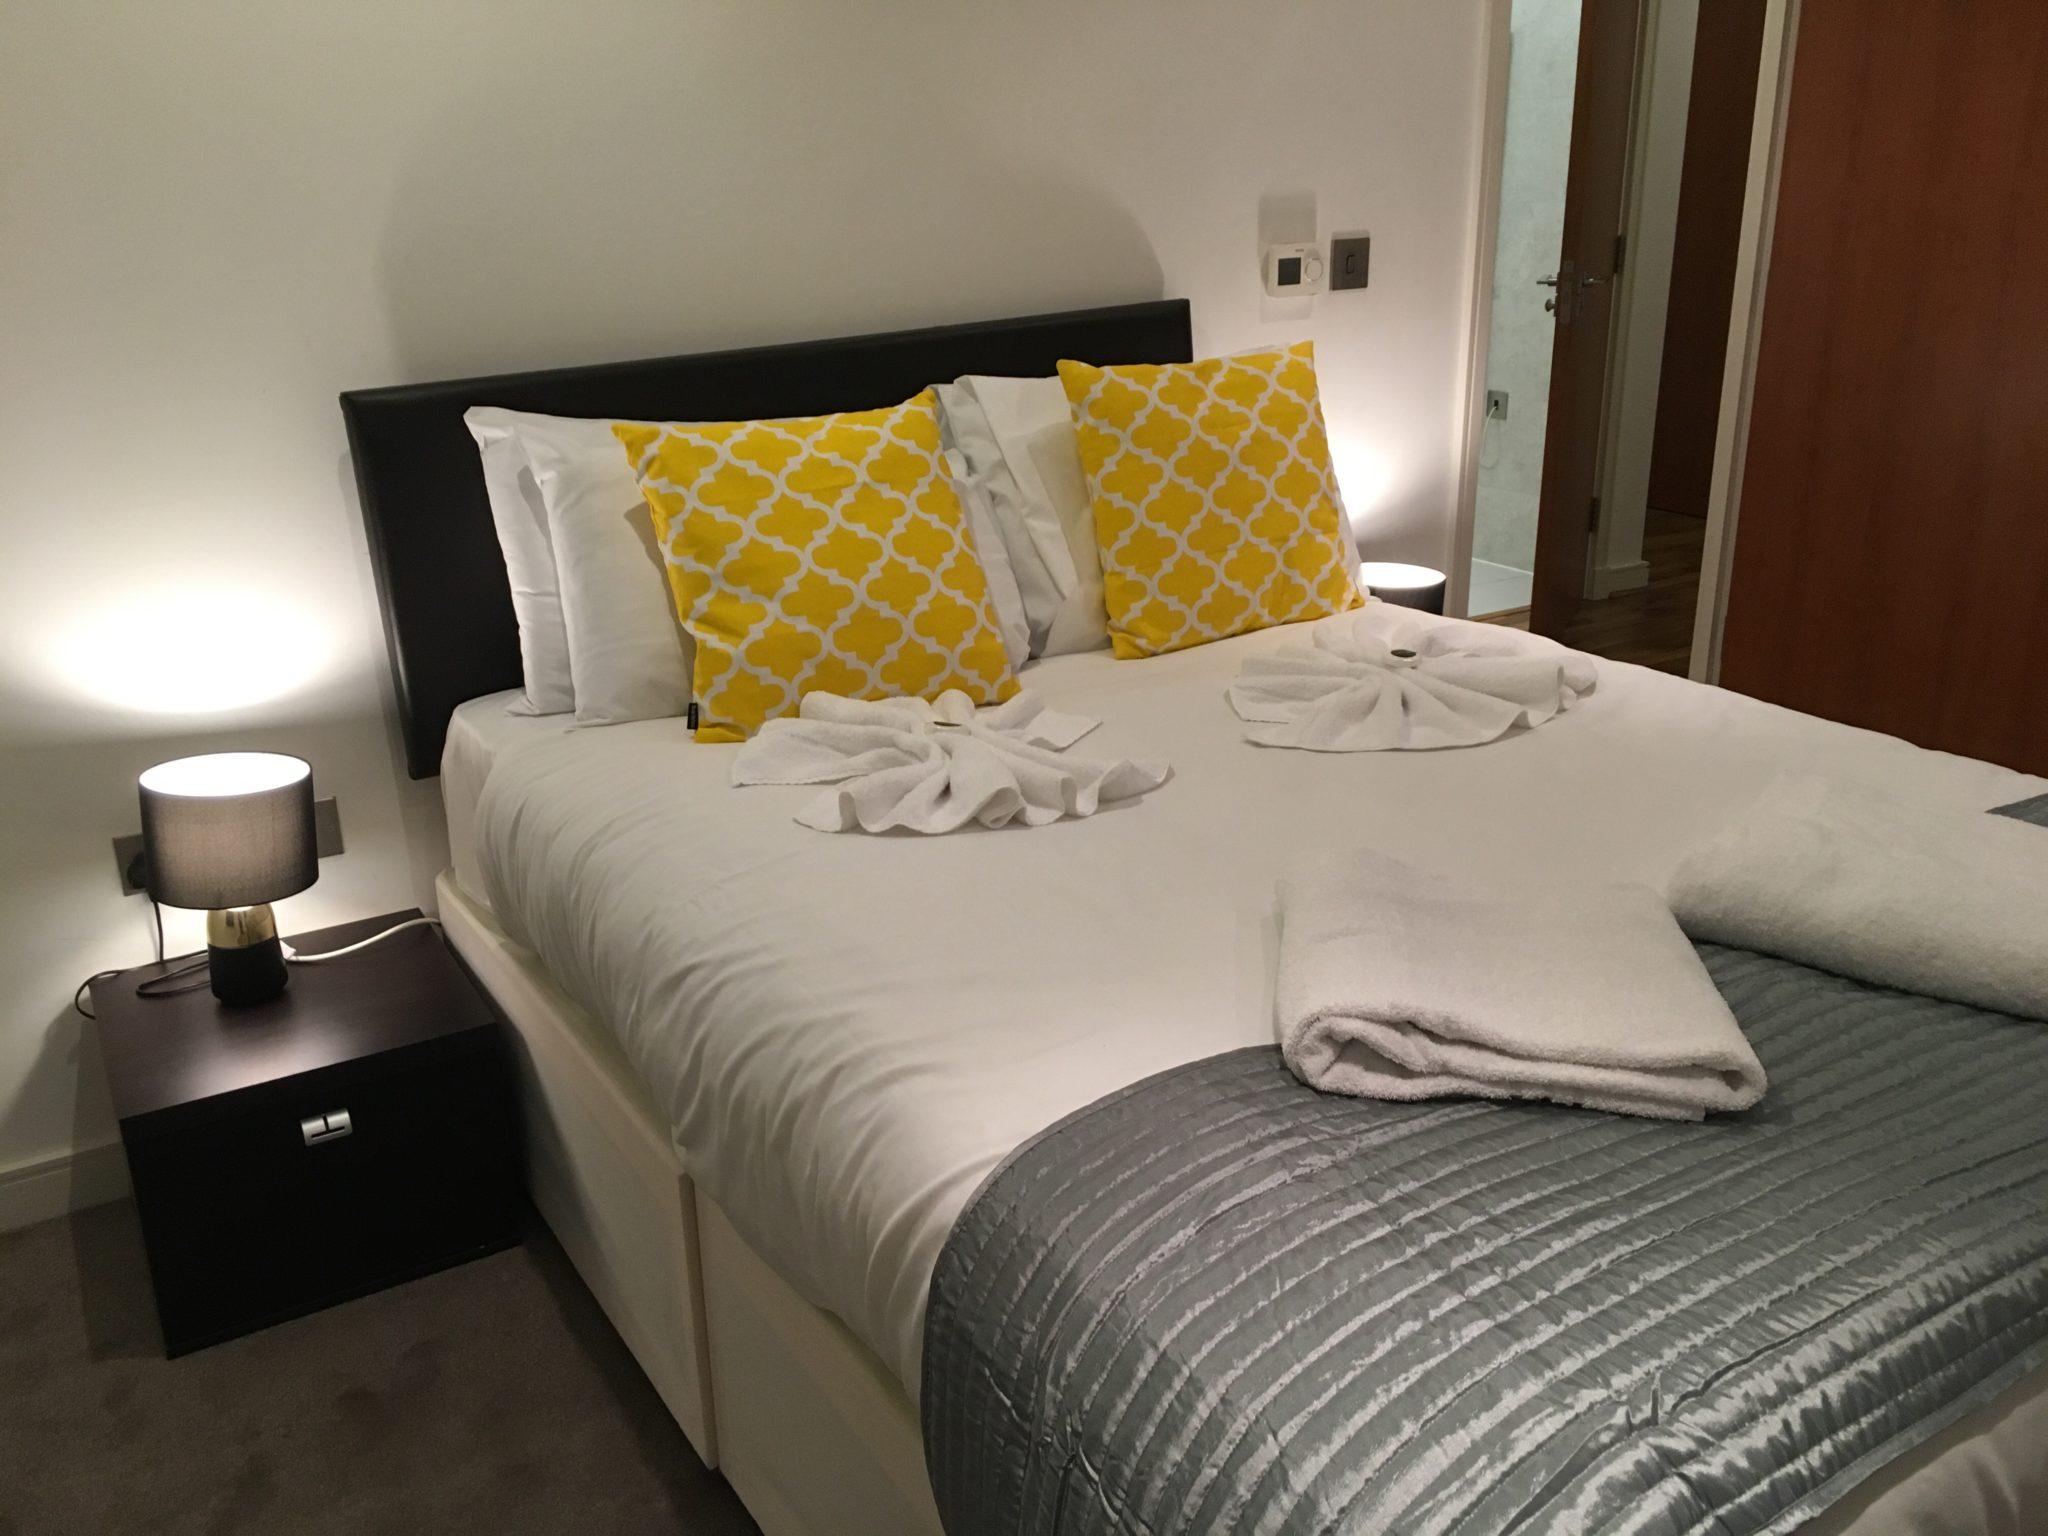 King's-Cross-Serviced-Apartments-London---Corporate-Short-Let-Accommodation-London---Luxury-Accommodation-Euston-London-|-Urban-Stay